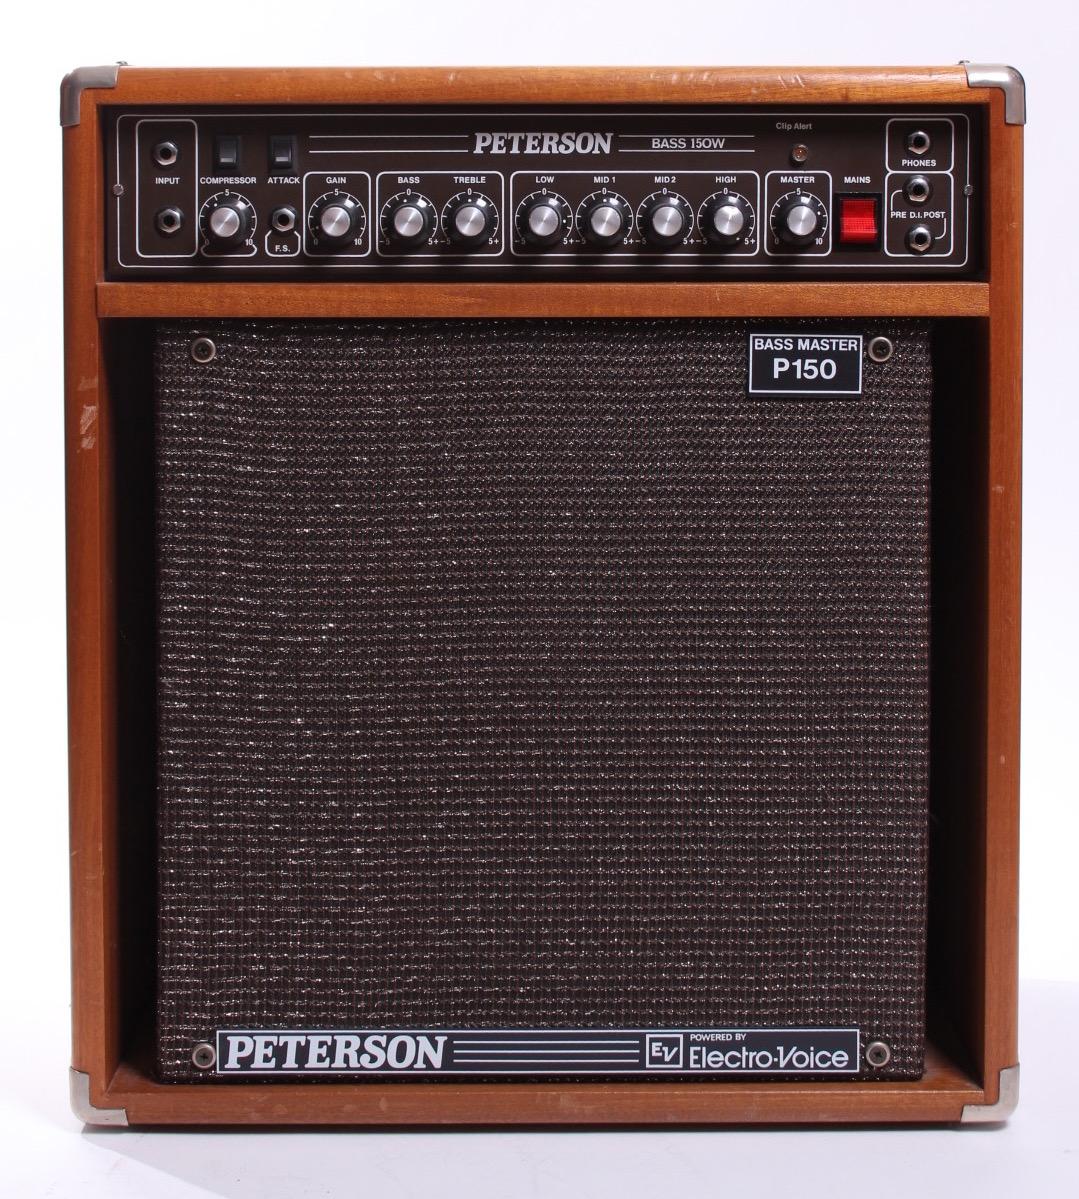 peterson bass master p 150 1980 natural amp for sale yeahman 39 s guitars. Black Bedroom Furniture Sets. Home Design Ideas